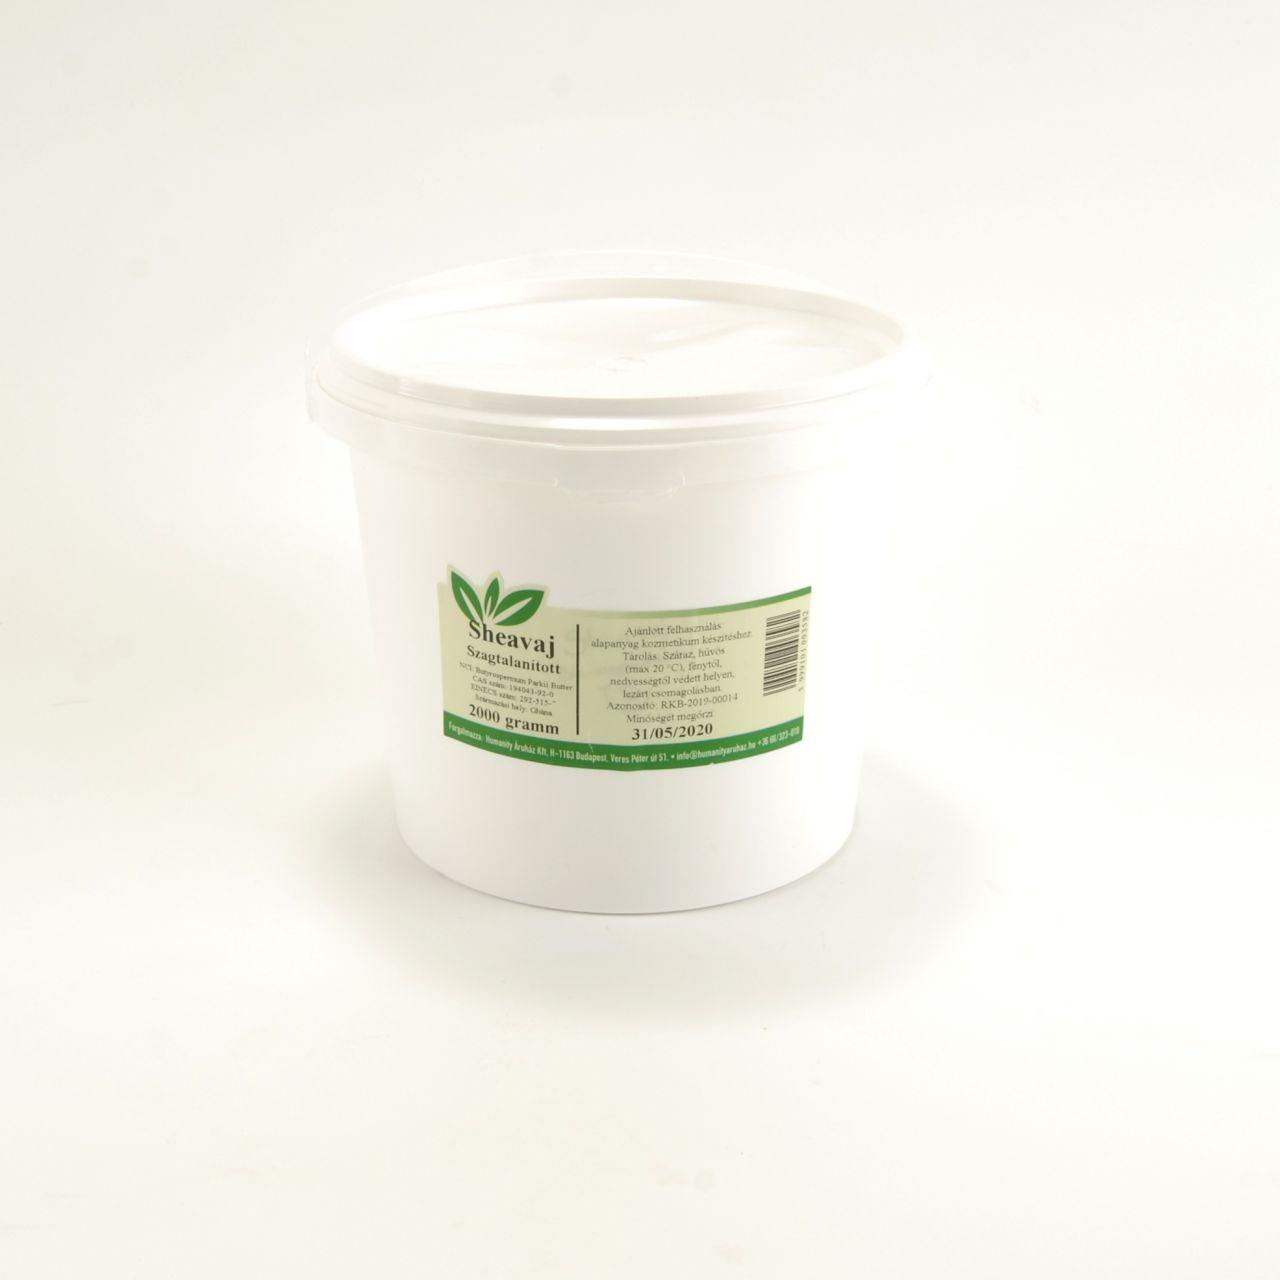 Shea vaj tömb (dezodorált) 2000 gramm